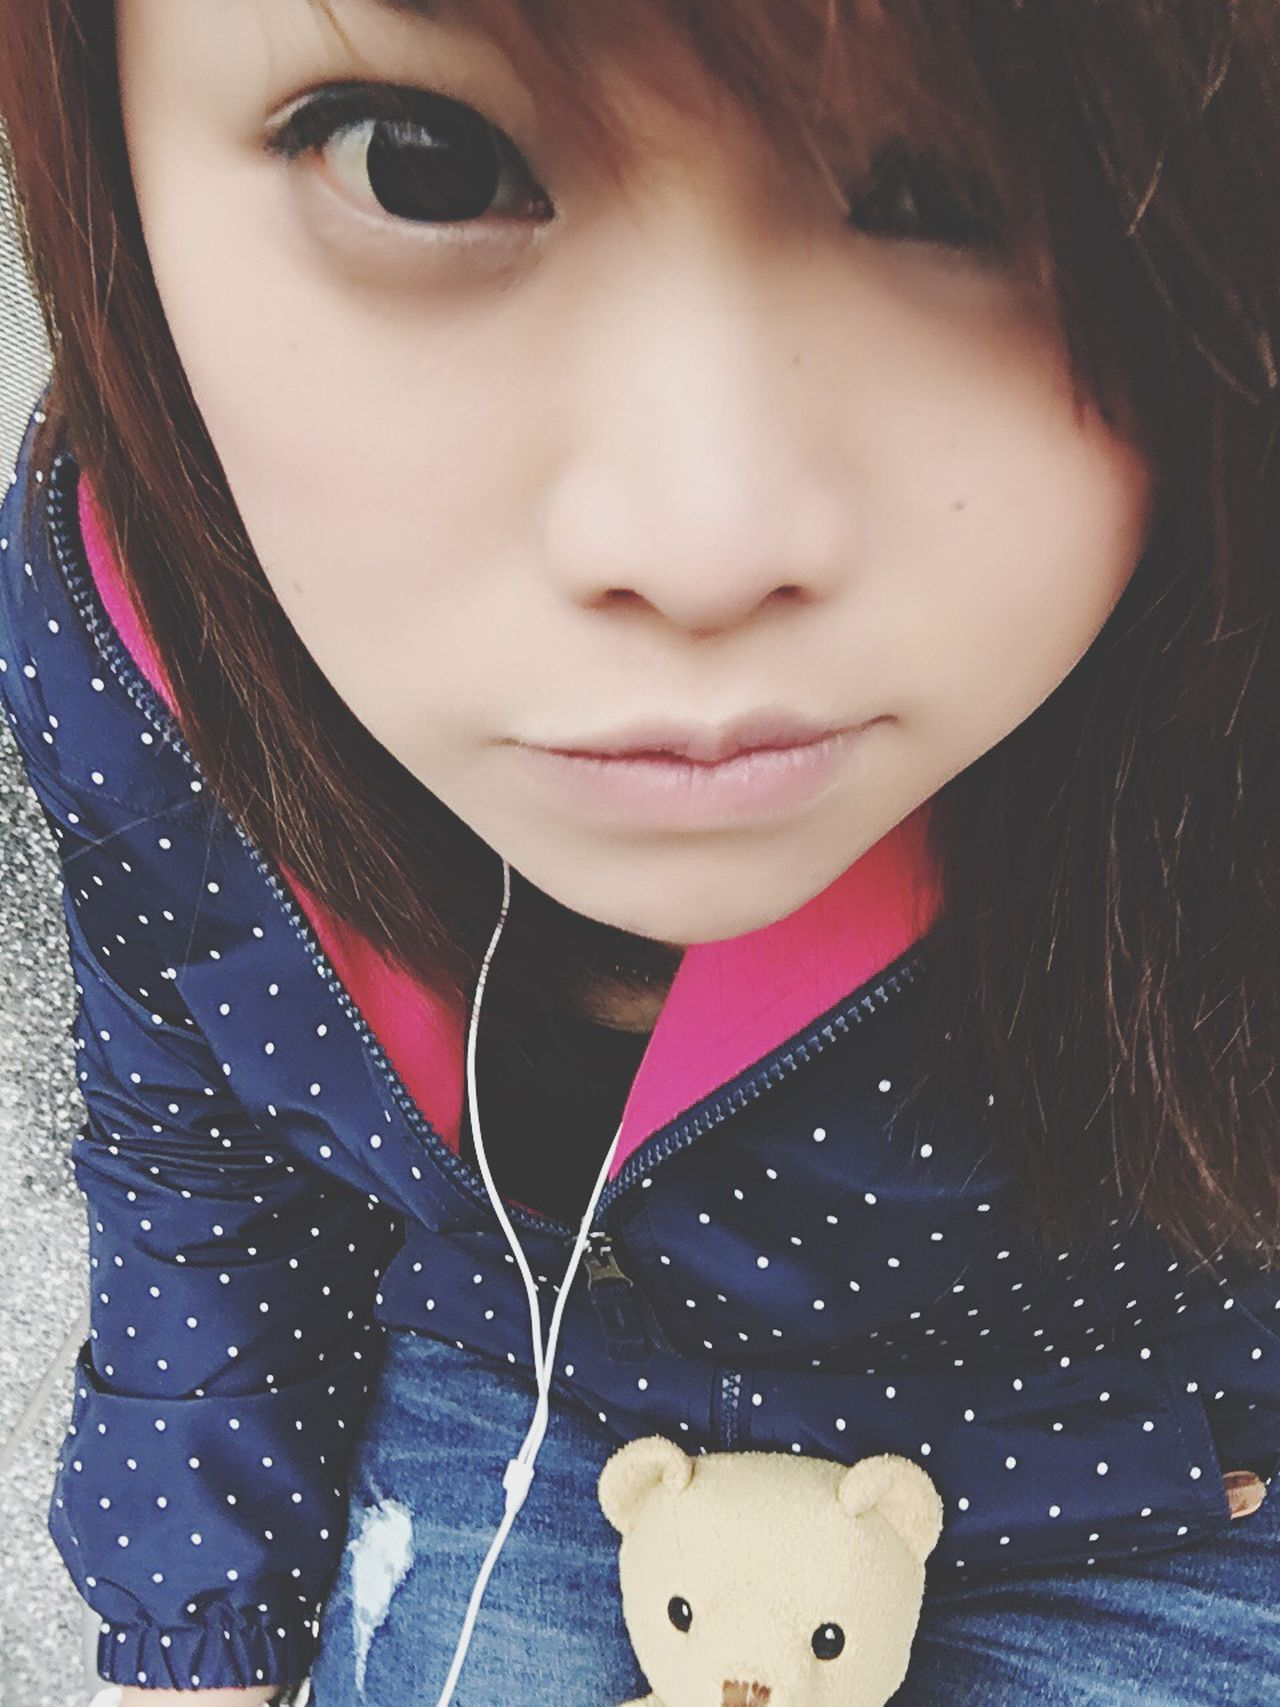 My Mhee & i.... ThatsMe Mymheeandi Selfie ✌ Self Portrait Myself Hello World Enjoying Myself Taking Photos Mymheegoeverwheres Mybear Cheese! Relaxing Creative Park Huashan Taipei Taiwan Traveling Vacation Enjoying Life EyeEm Best Shots My Bear Story